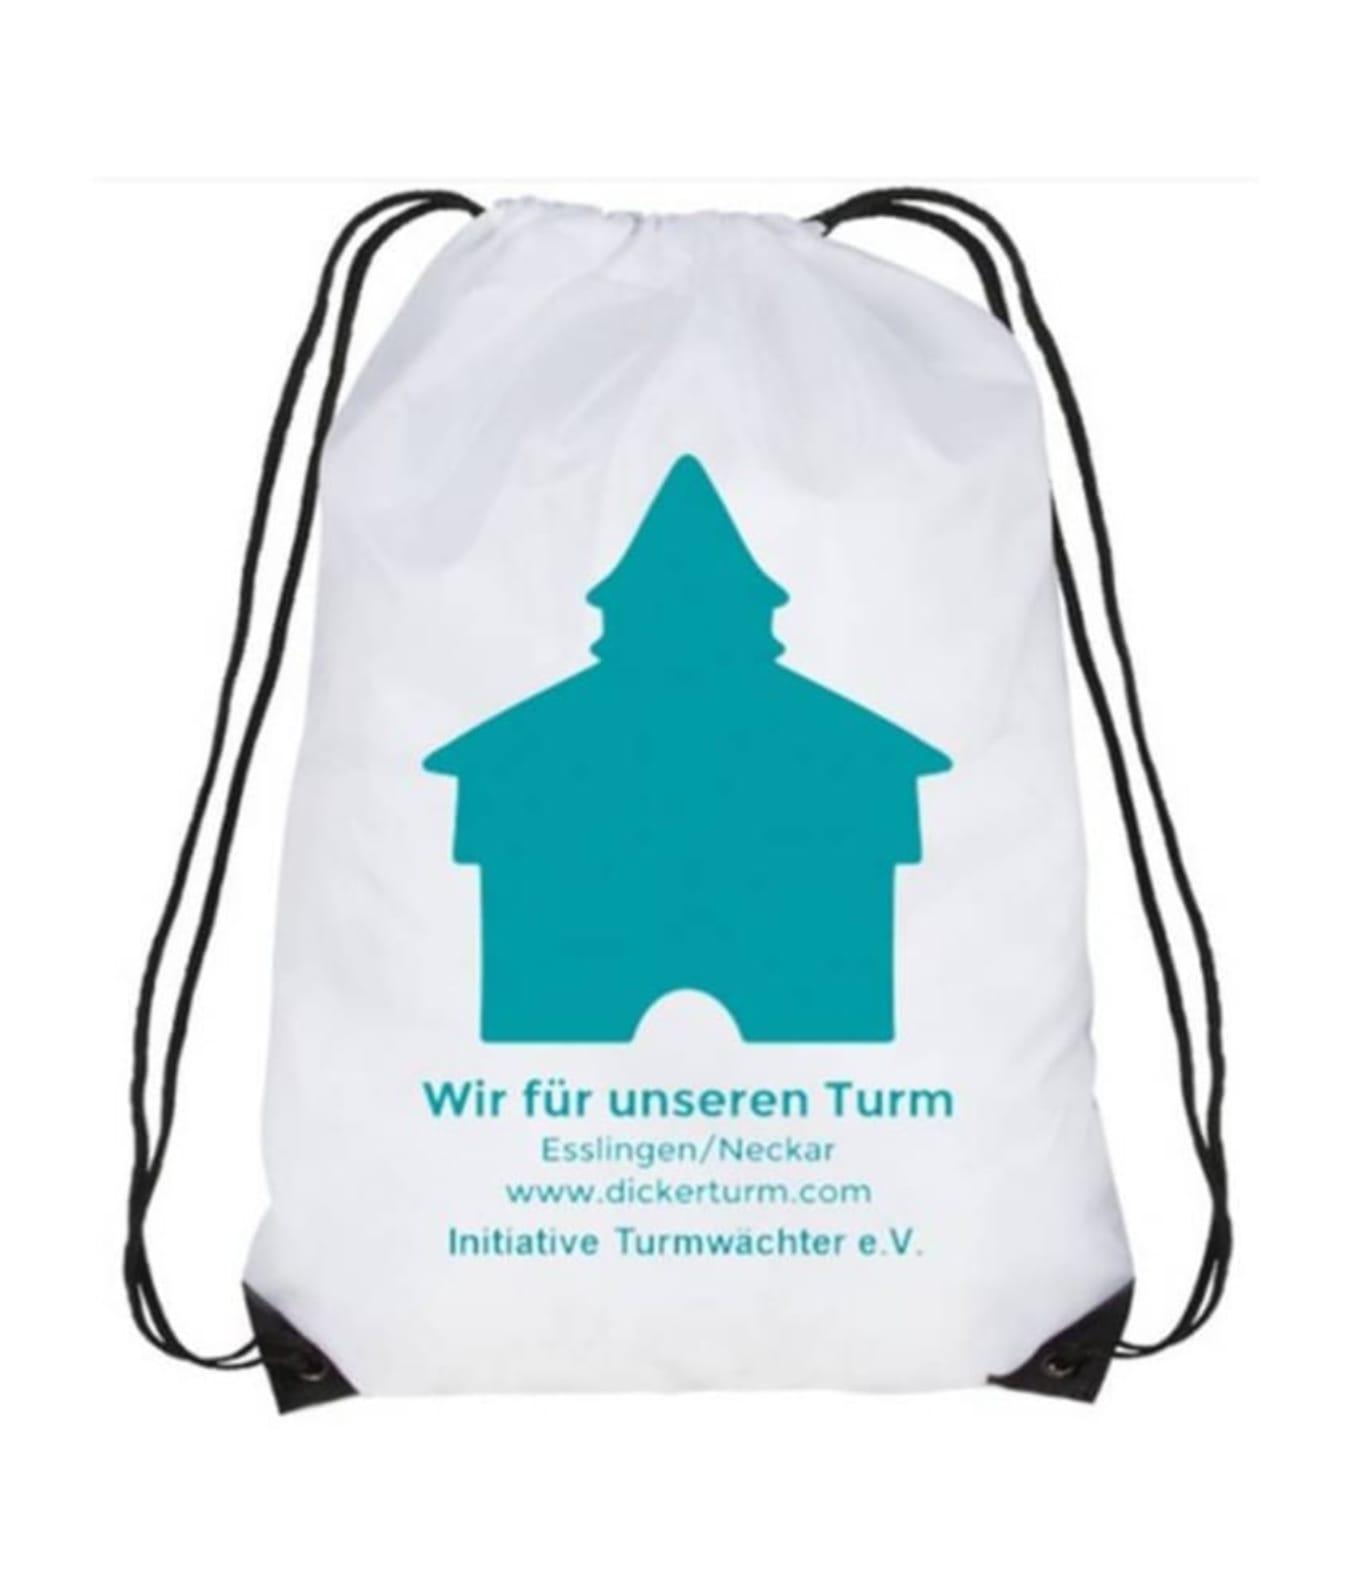 Turm-Beutel-Initiative-Turmwaechter-Dicker-Turm-Esslingen-1